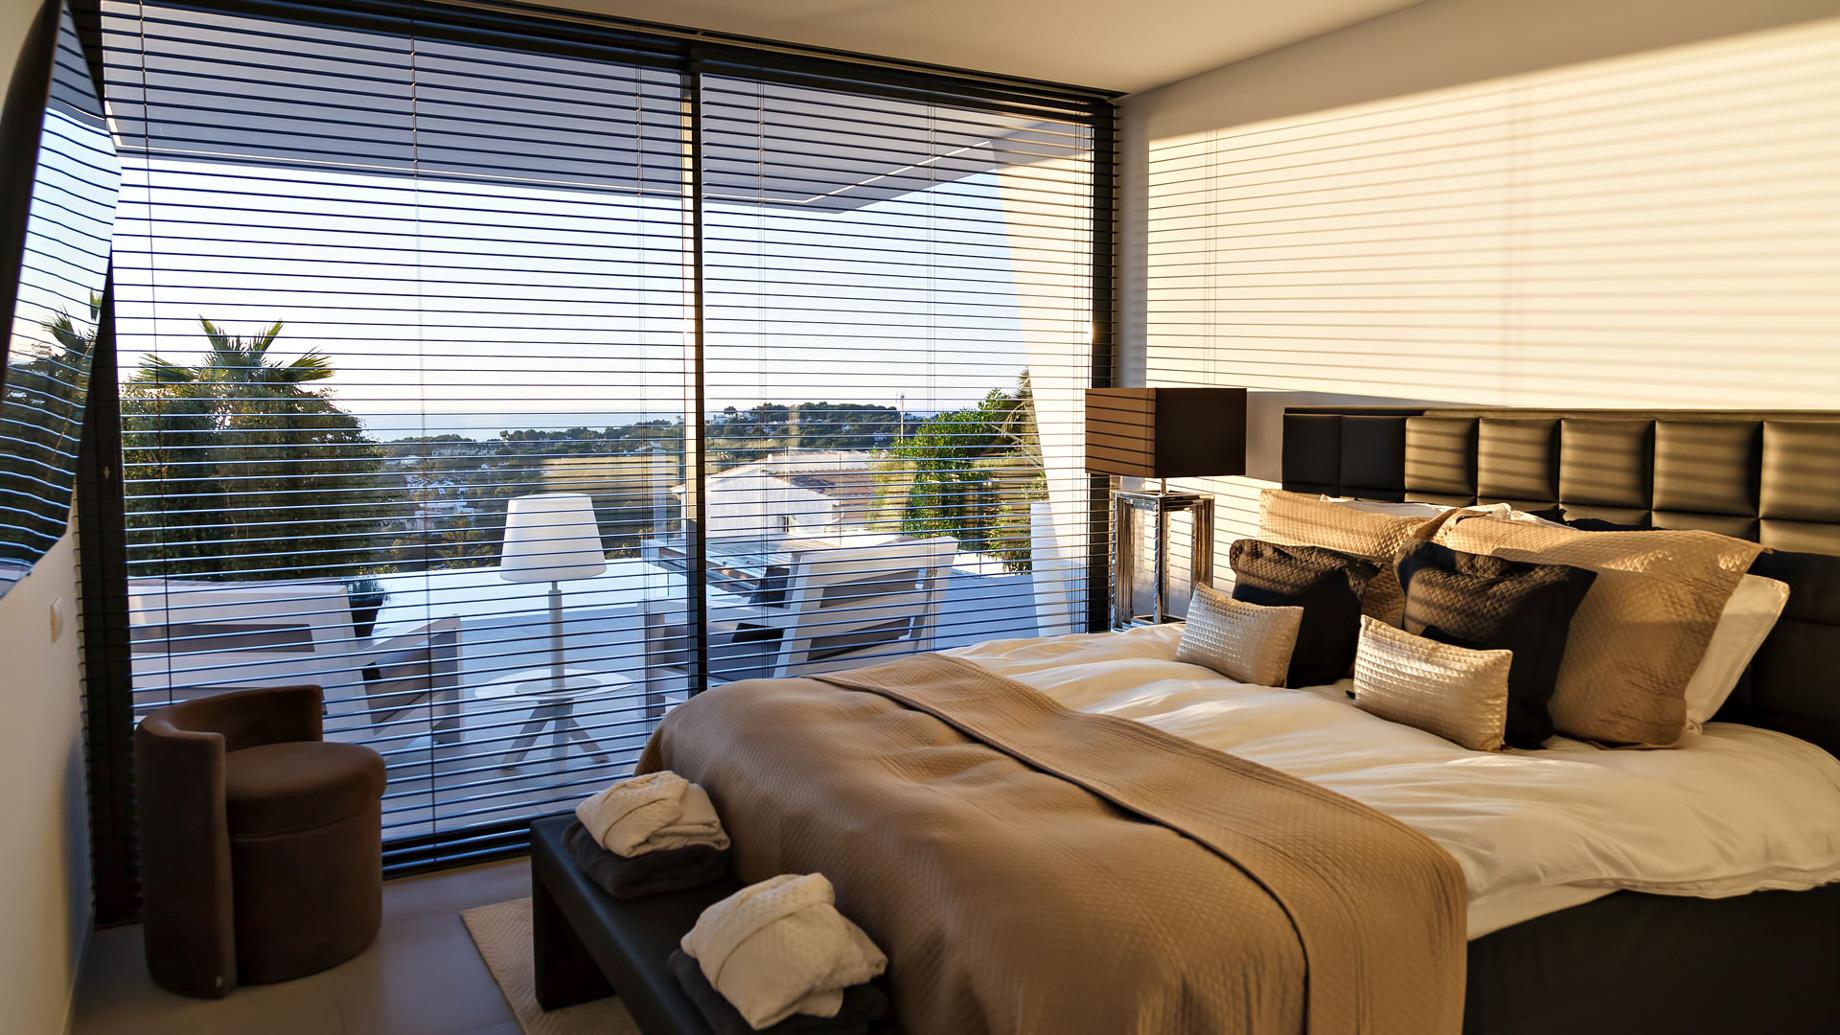 Benimeit Luxury Villa - Moraira, Alicante, Spain